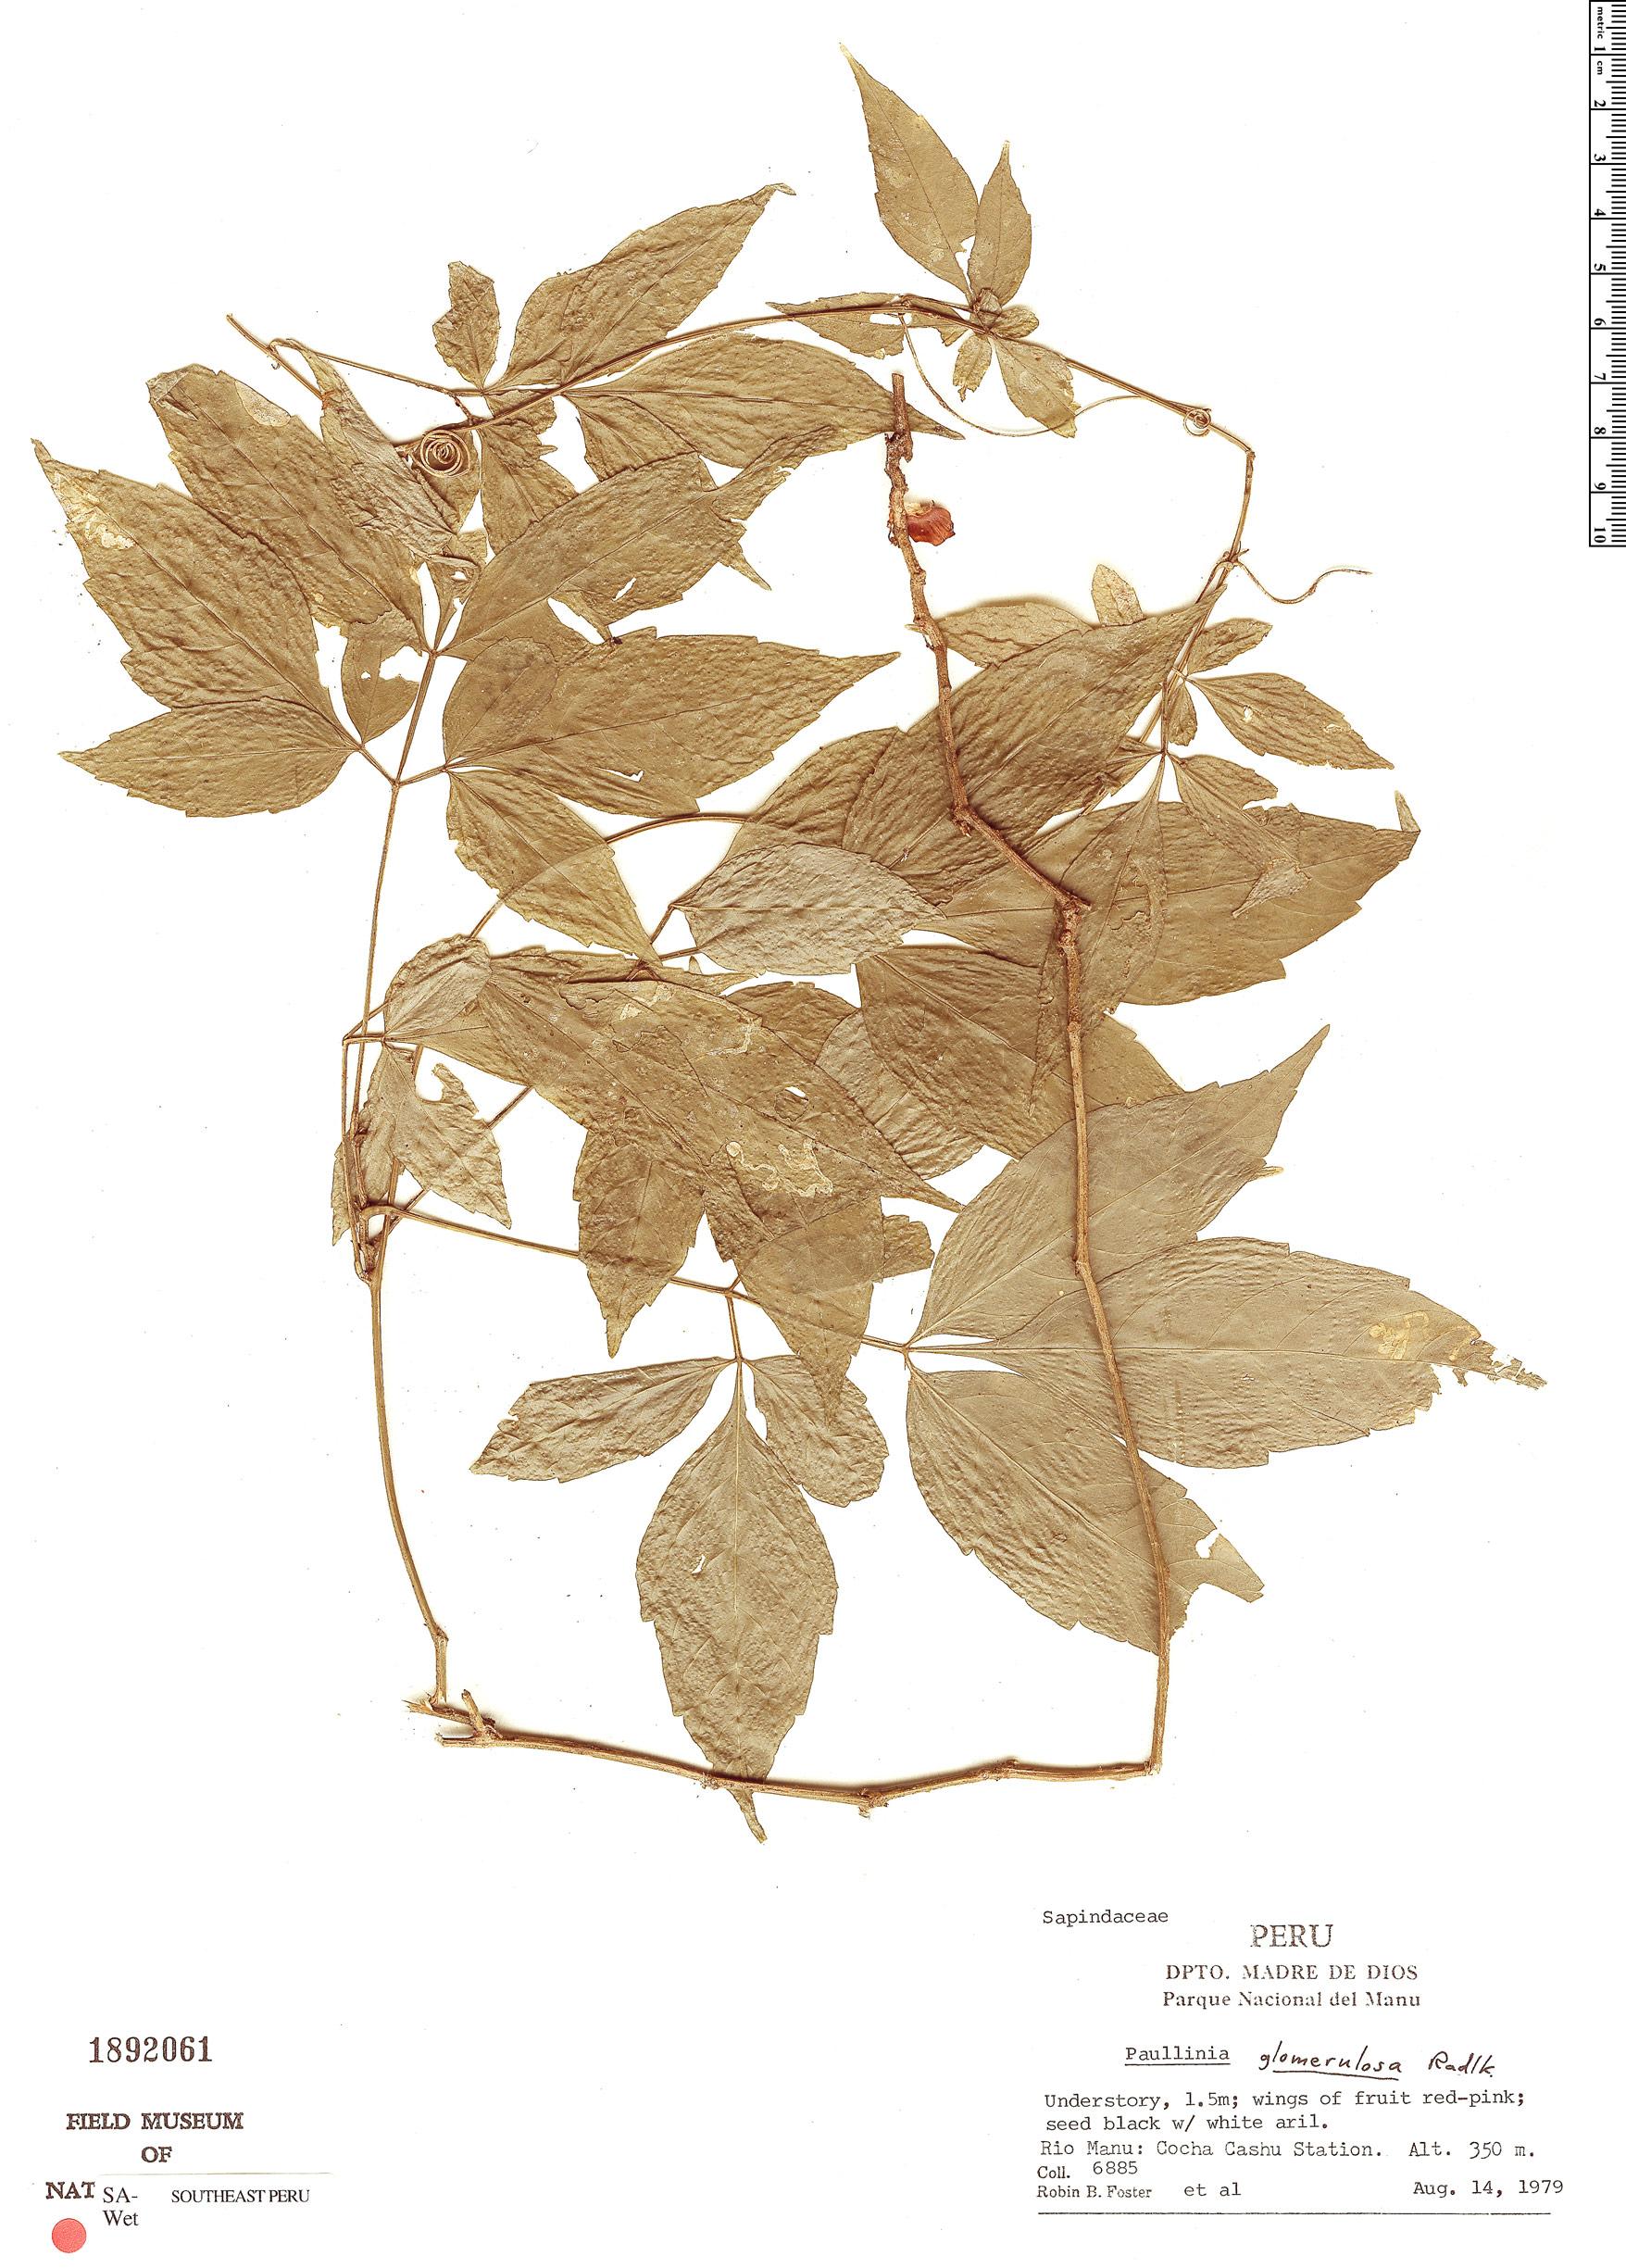 Specimen: Paullinia glomerulosa